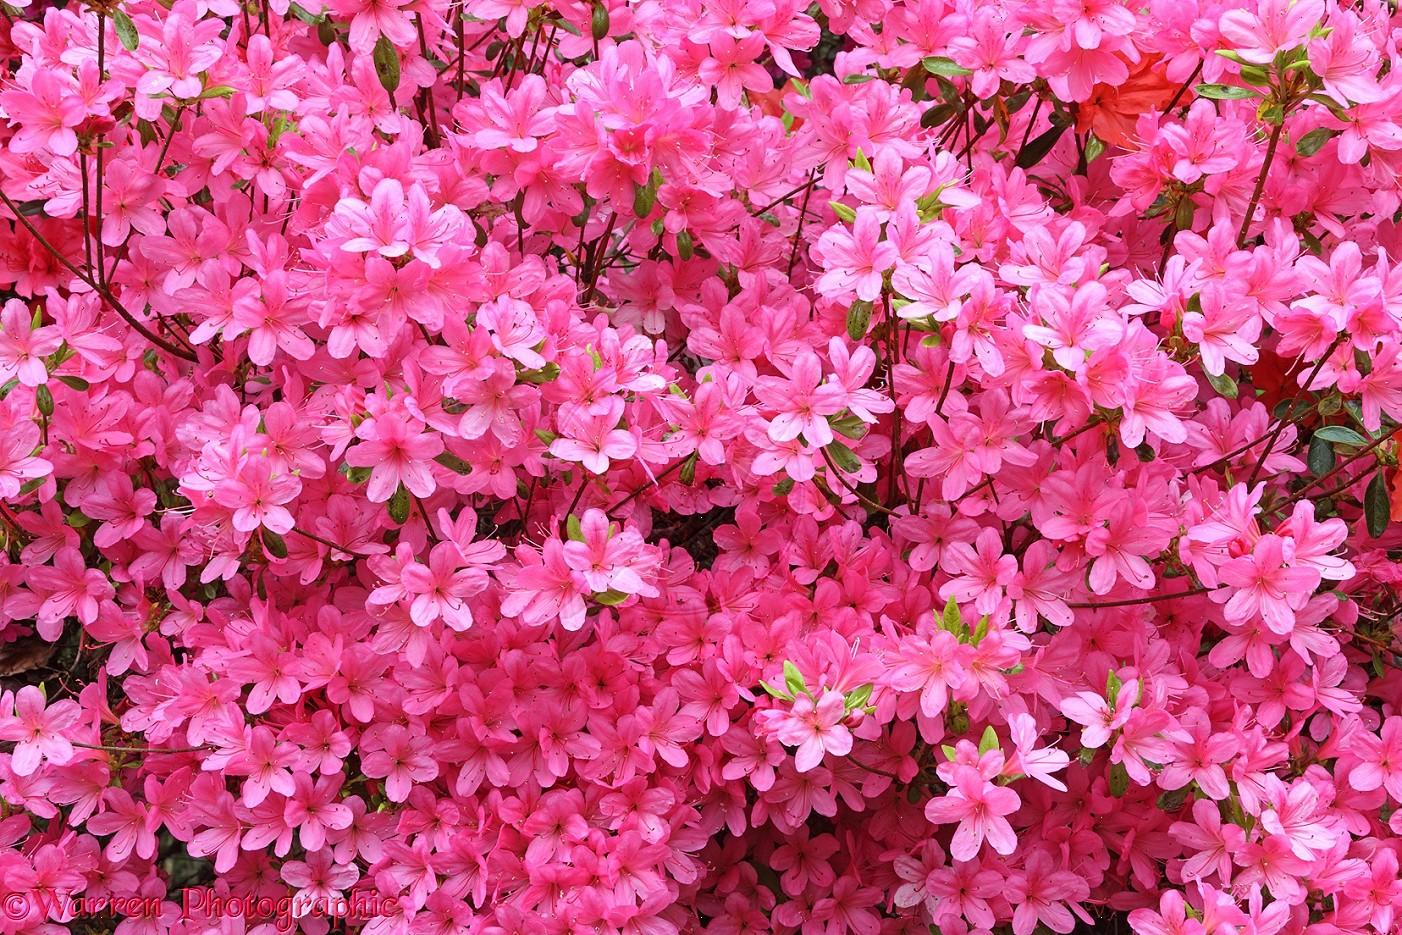 High Resolution Flower Wallpaper: Red Flowers In May 11 High Resolution Wallpaper